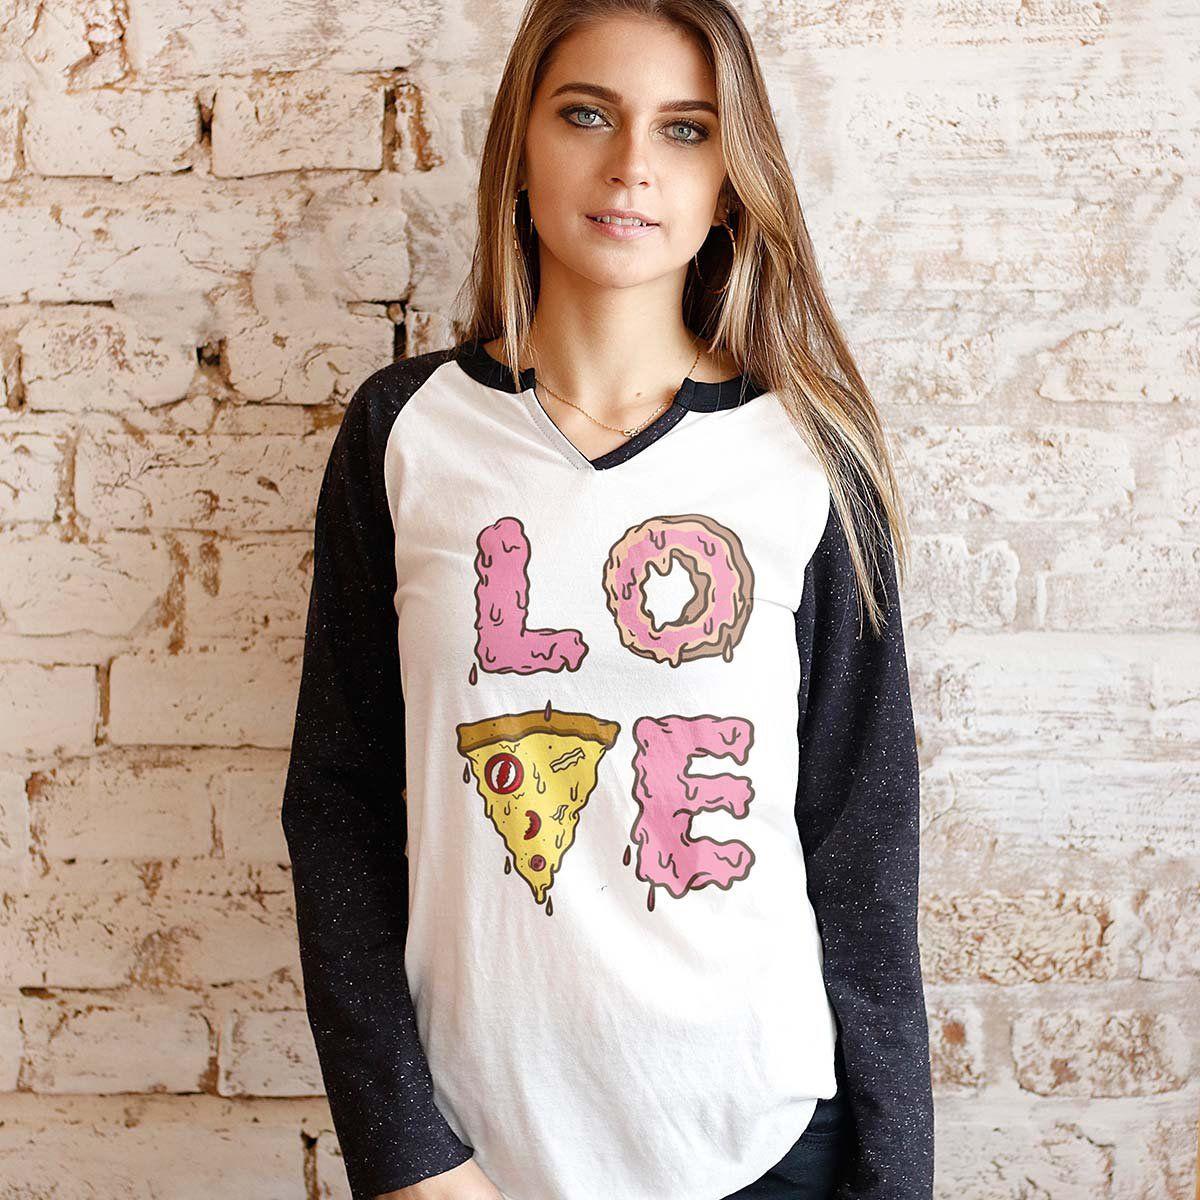 Camiseta Manga Longa Feminina TodaTeen Love Pizza  - bandUP Store Marketplace